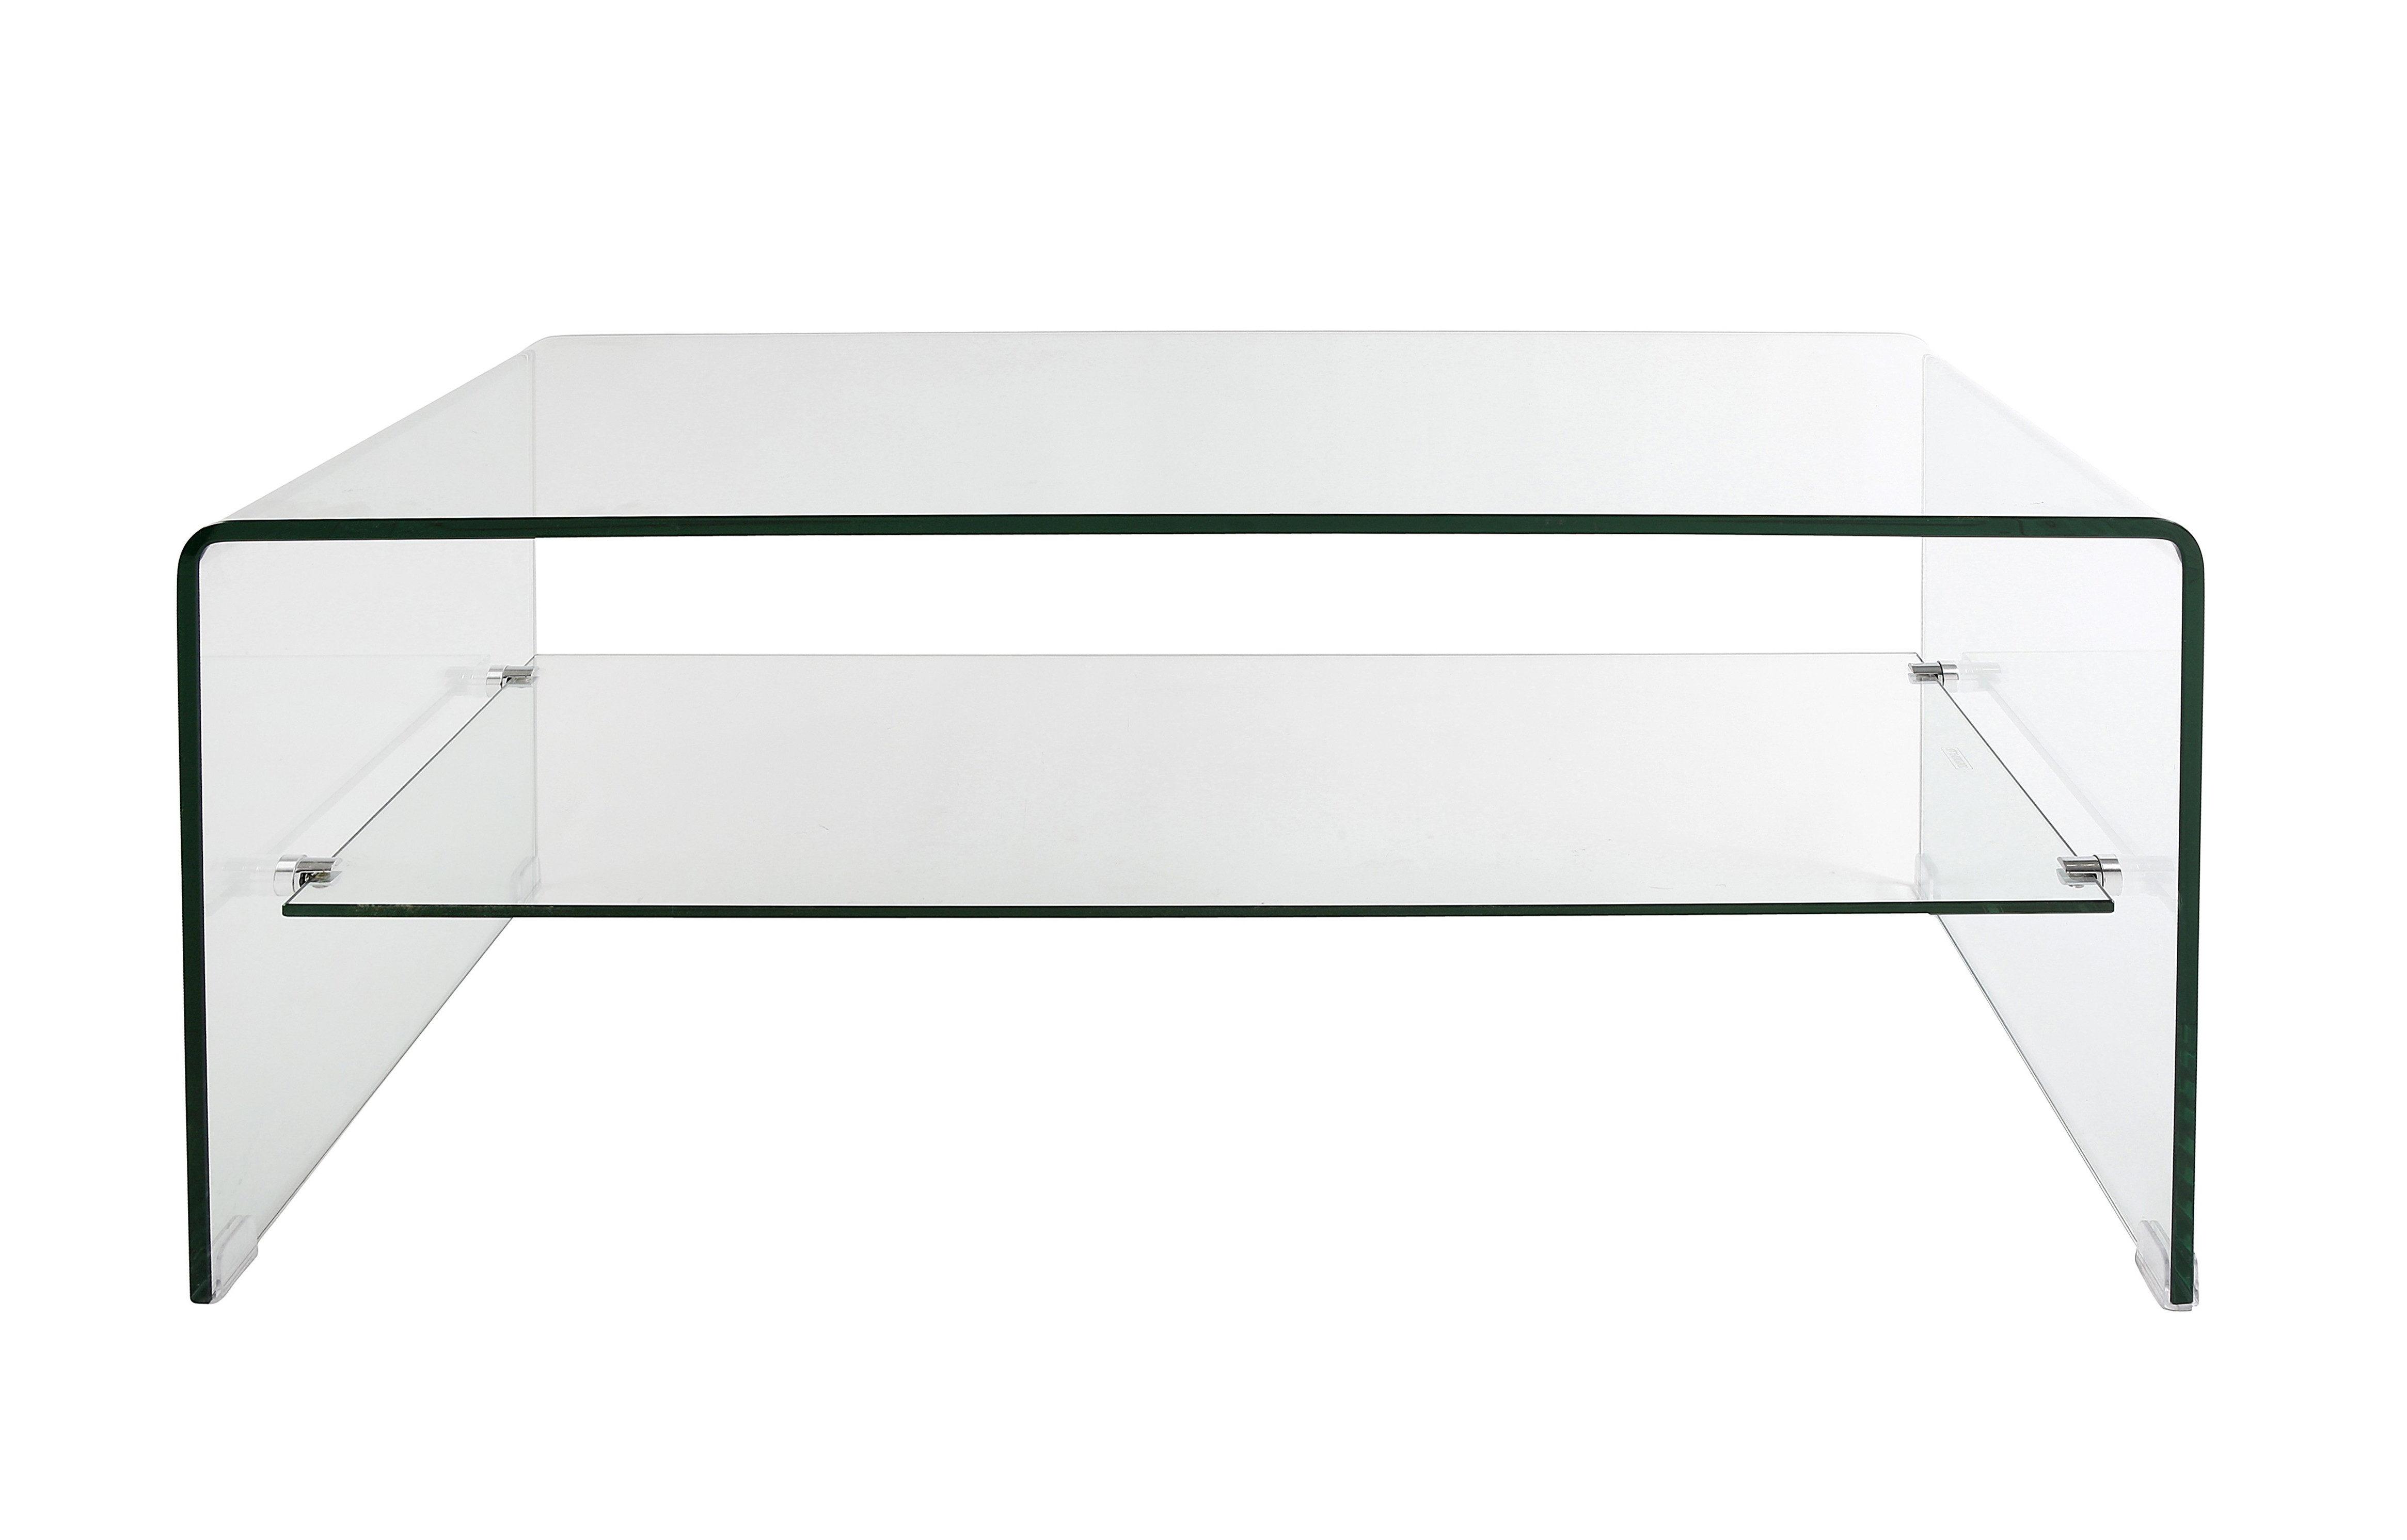 dfs glass coffee table with simple shape coffee table | raysa house